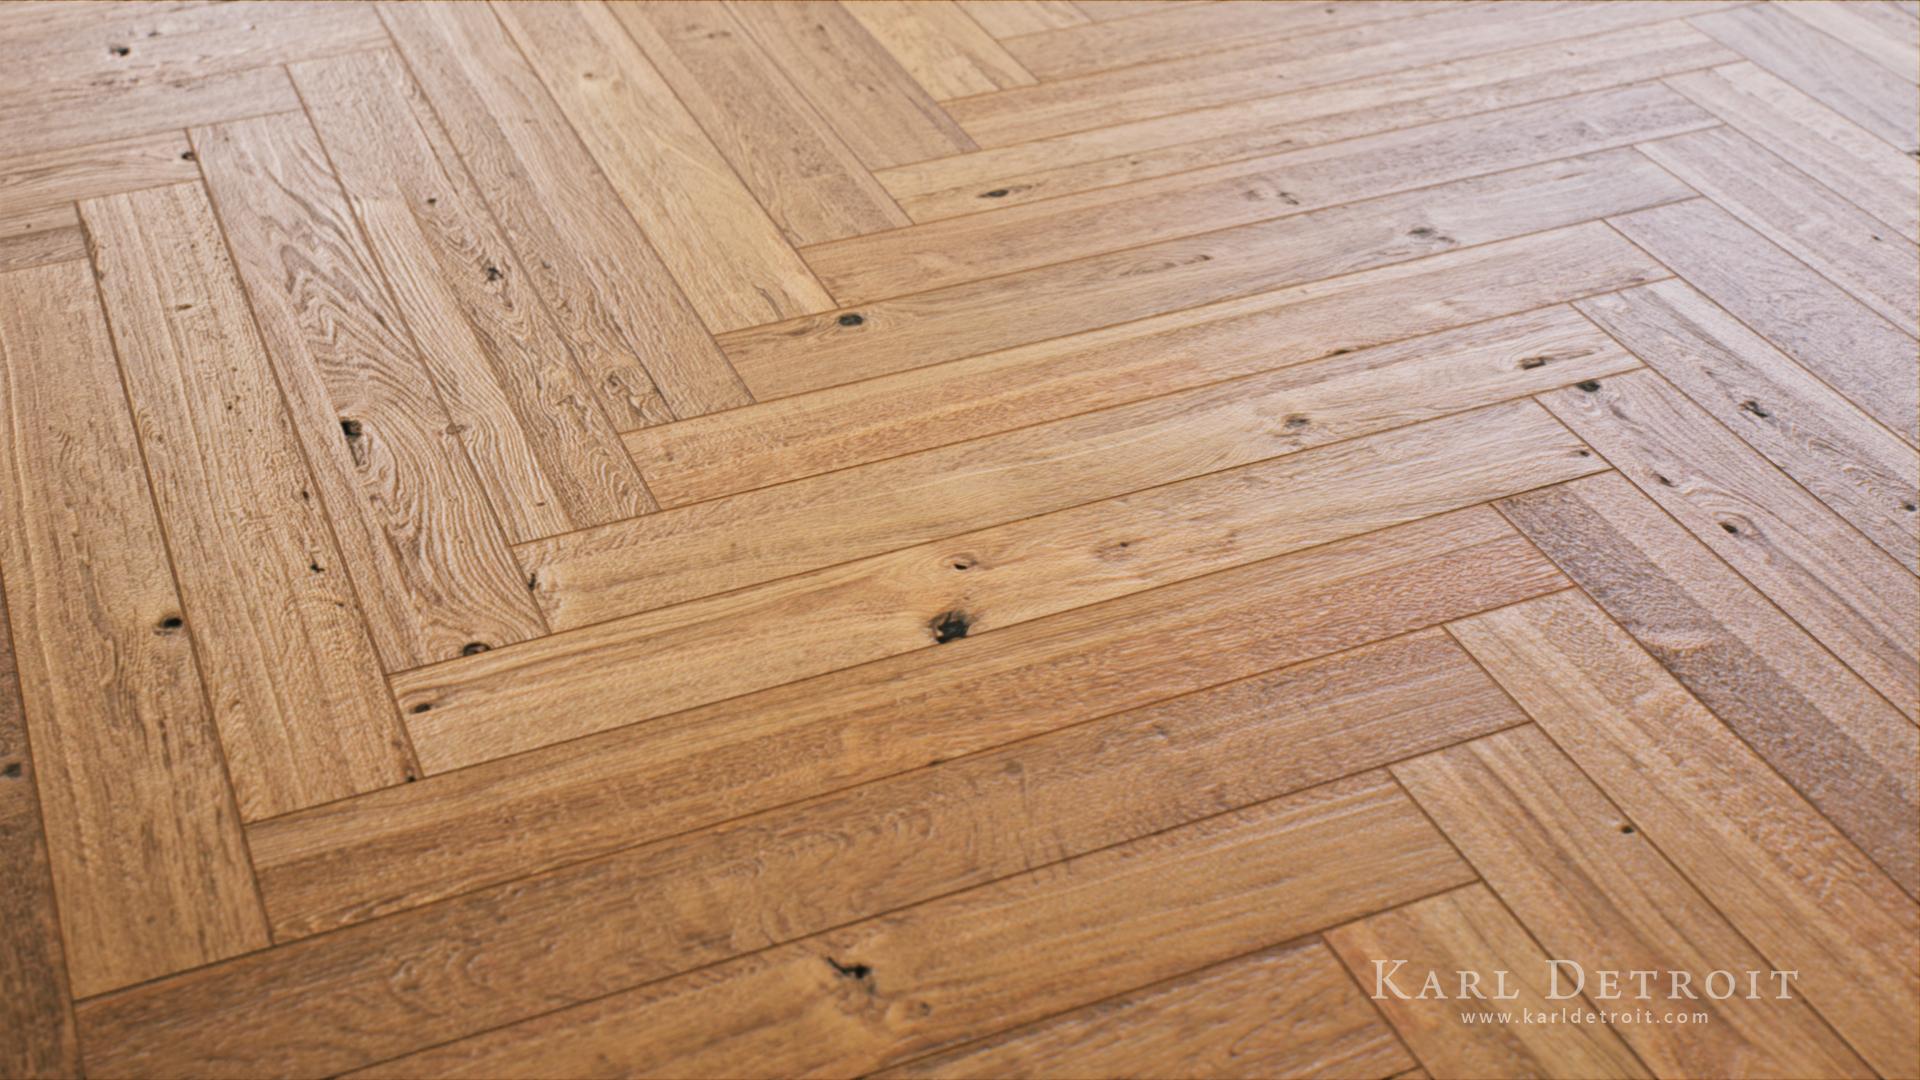 UE4%20Marketplace%204K%20Materials%20Wood%20Flooring%20Vol.02%2003 1920x1080 6588e7571be7ddcbb2ebd9372bfff859 - UE4木地板4K材质:Wood Flooring Vol 02